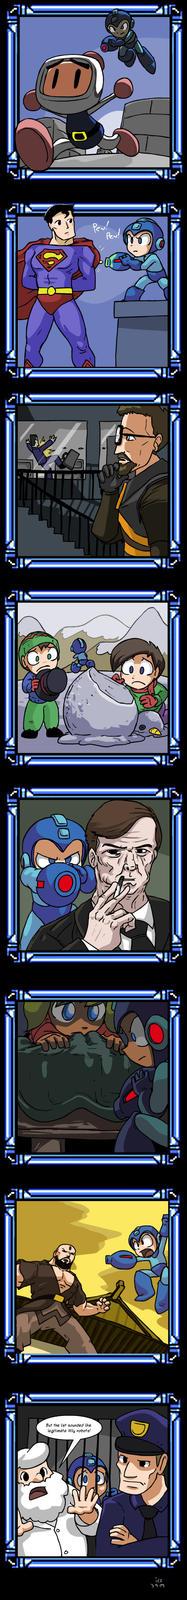 Leaked boss list from Megaman 11